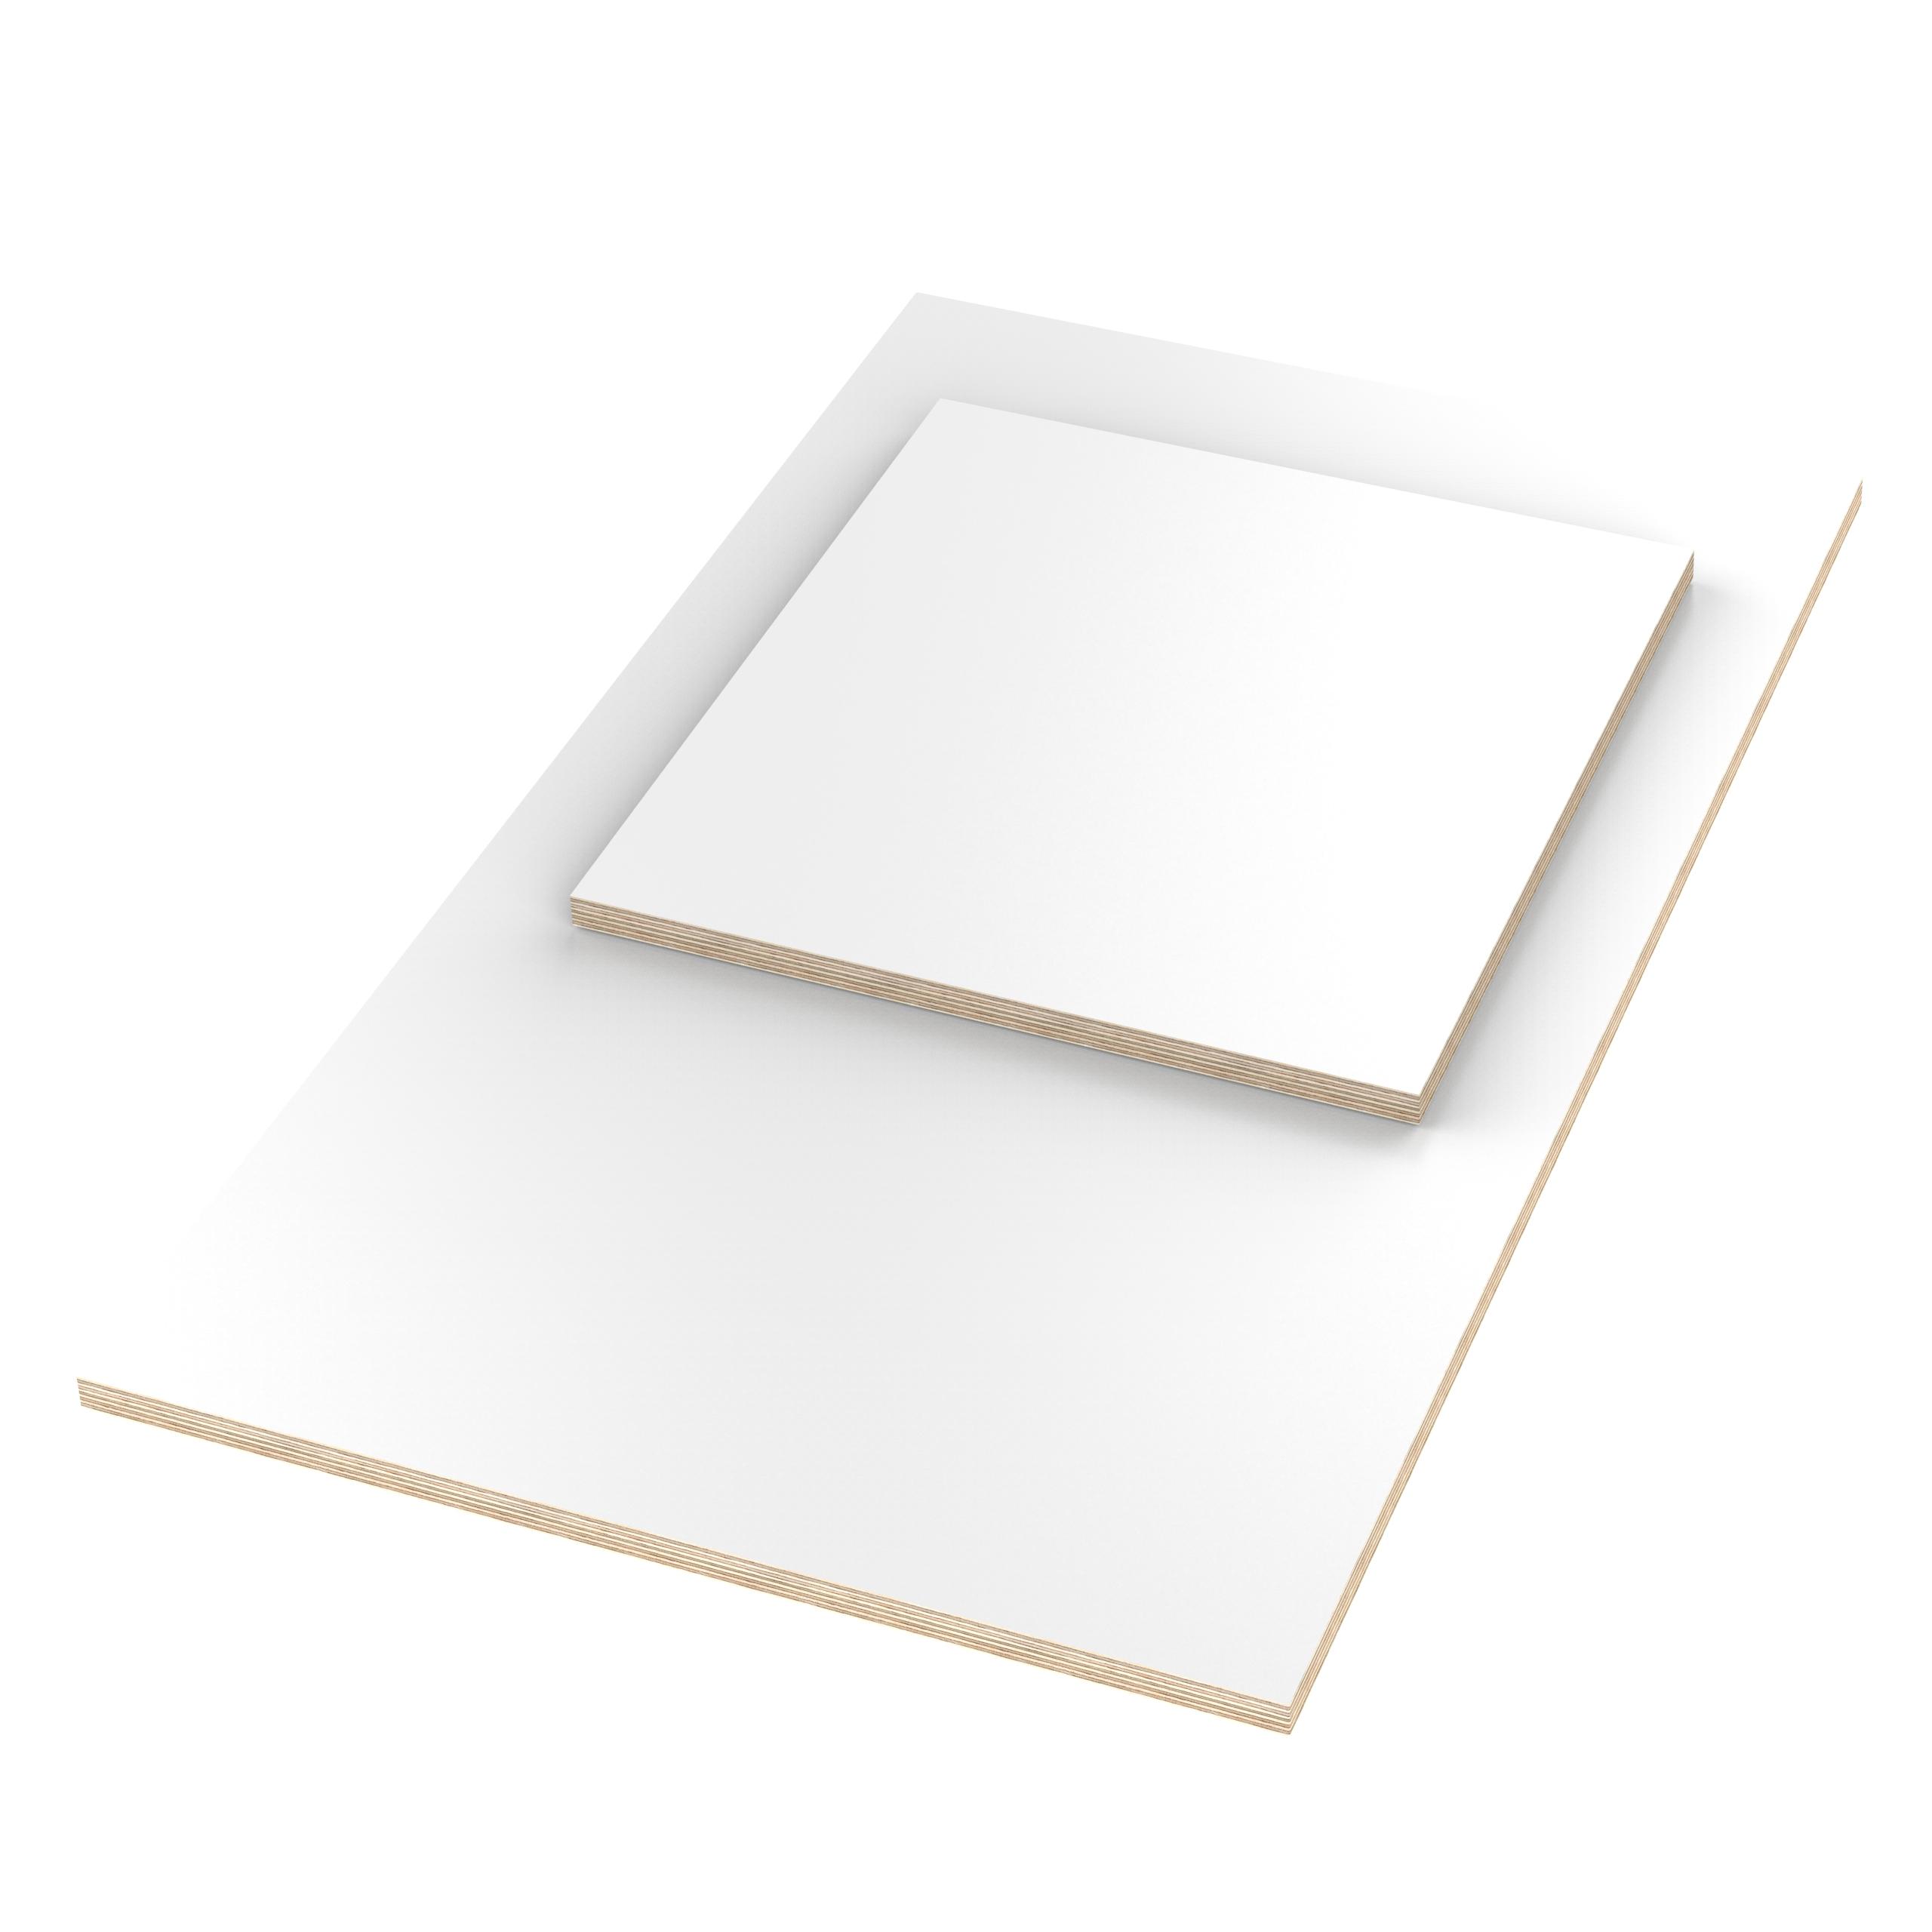 100x50 cm AUPROTEC Tischplatte 18mm schwarz 1000 mm x 500 mm rechteckige Multiplexplatte melaminbeschichtet von 40cm-200cm ausw/ählbar Birken-Sperrholzplatten Massiv Holz Industriequalit/ät Auswahl